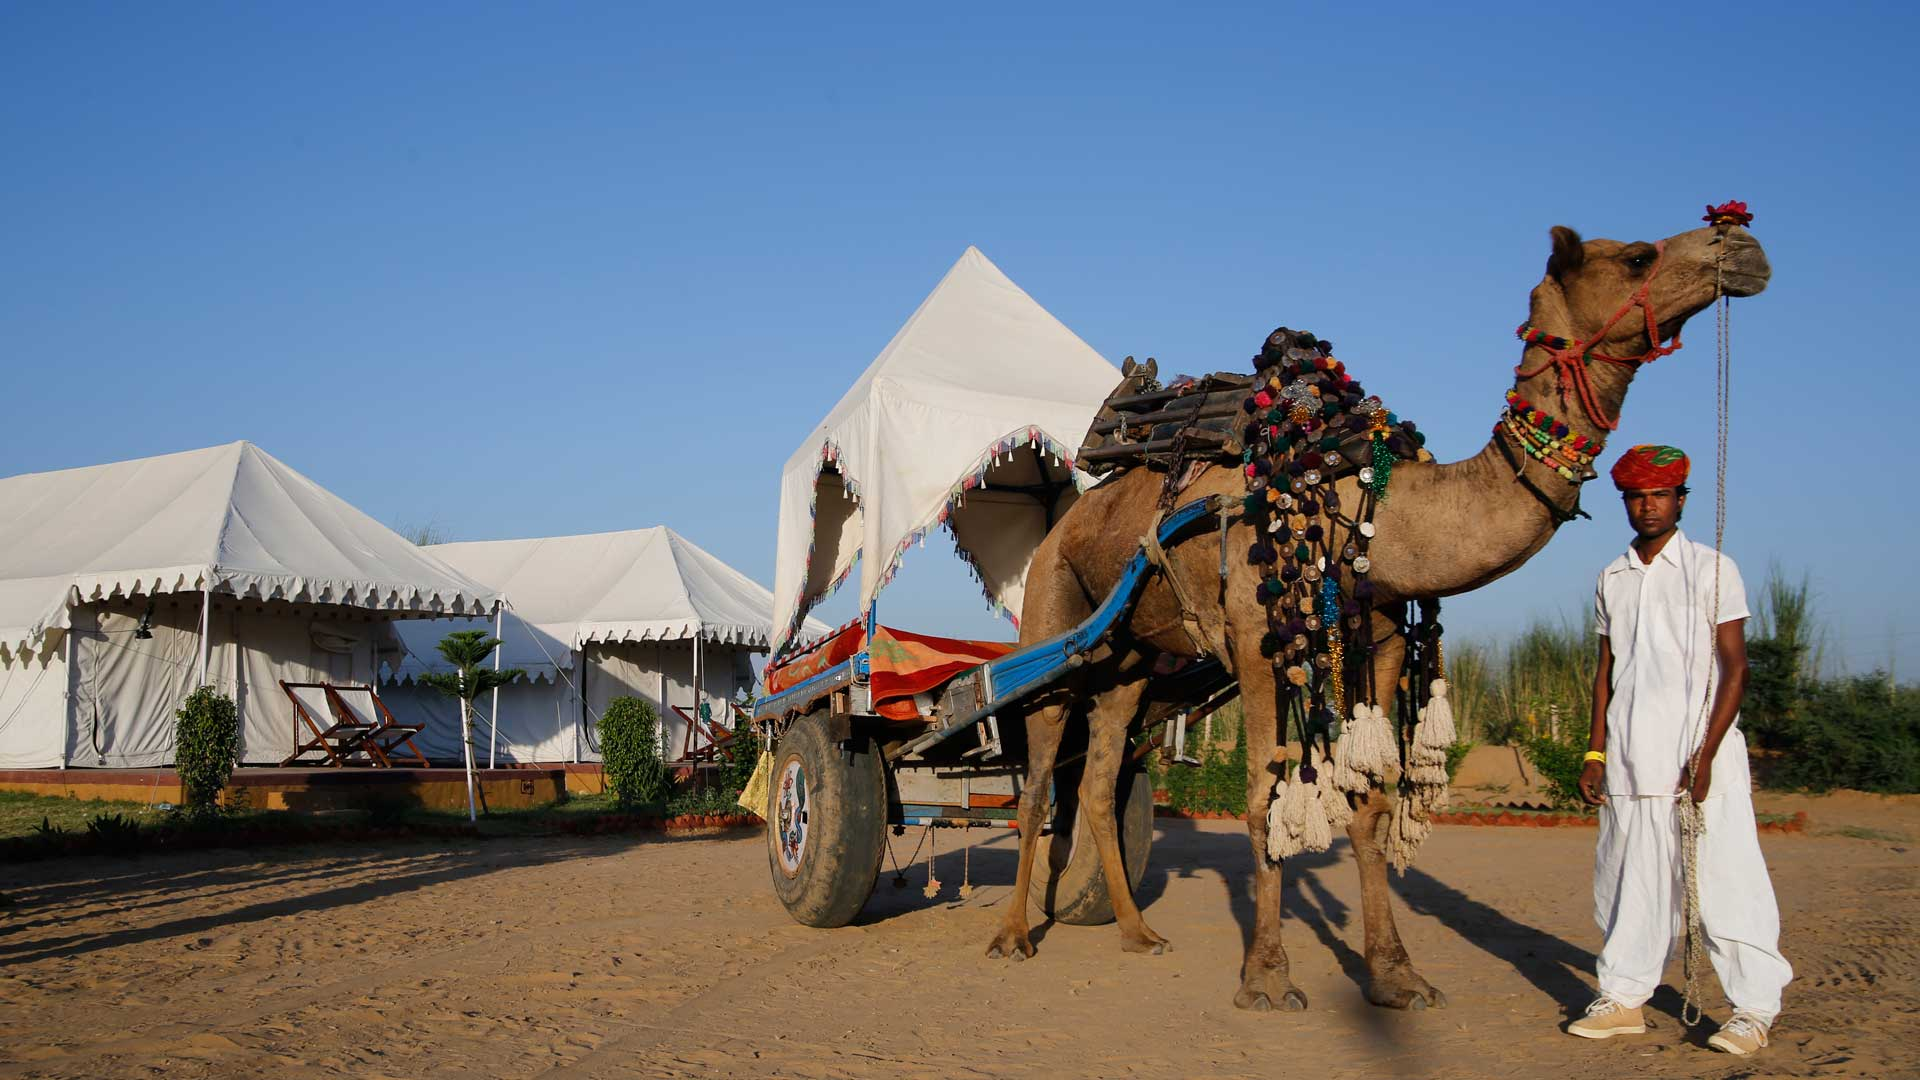 tent-camping-in-puskar-rajasthan